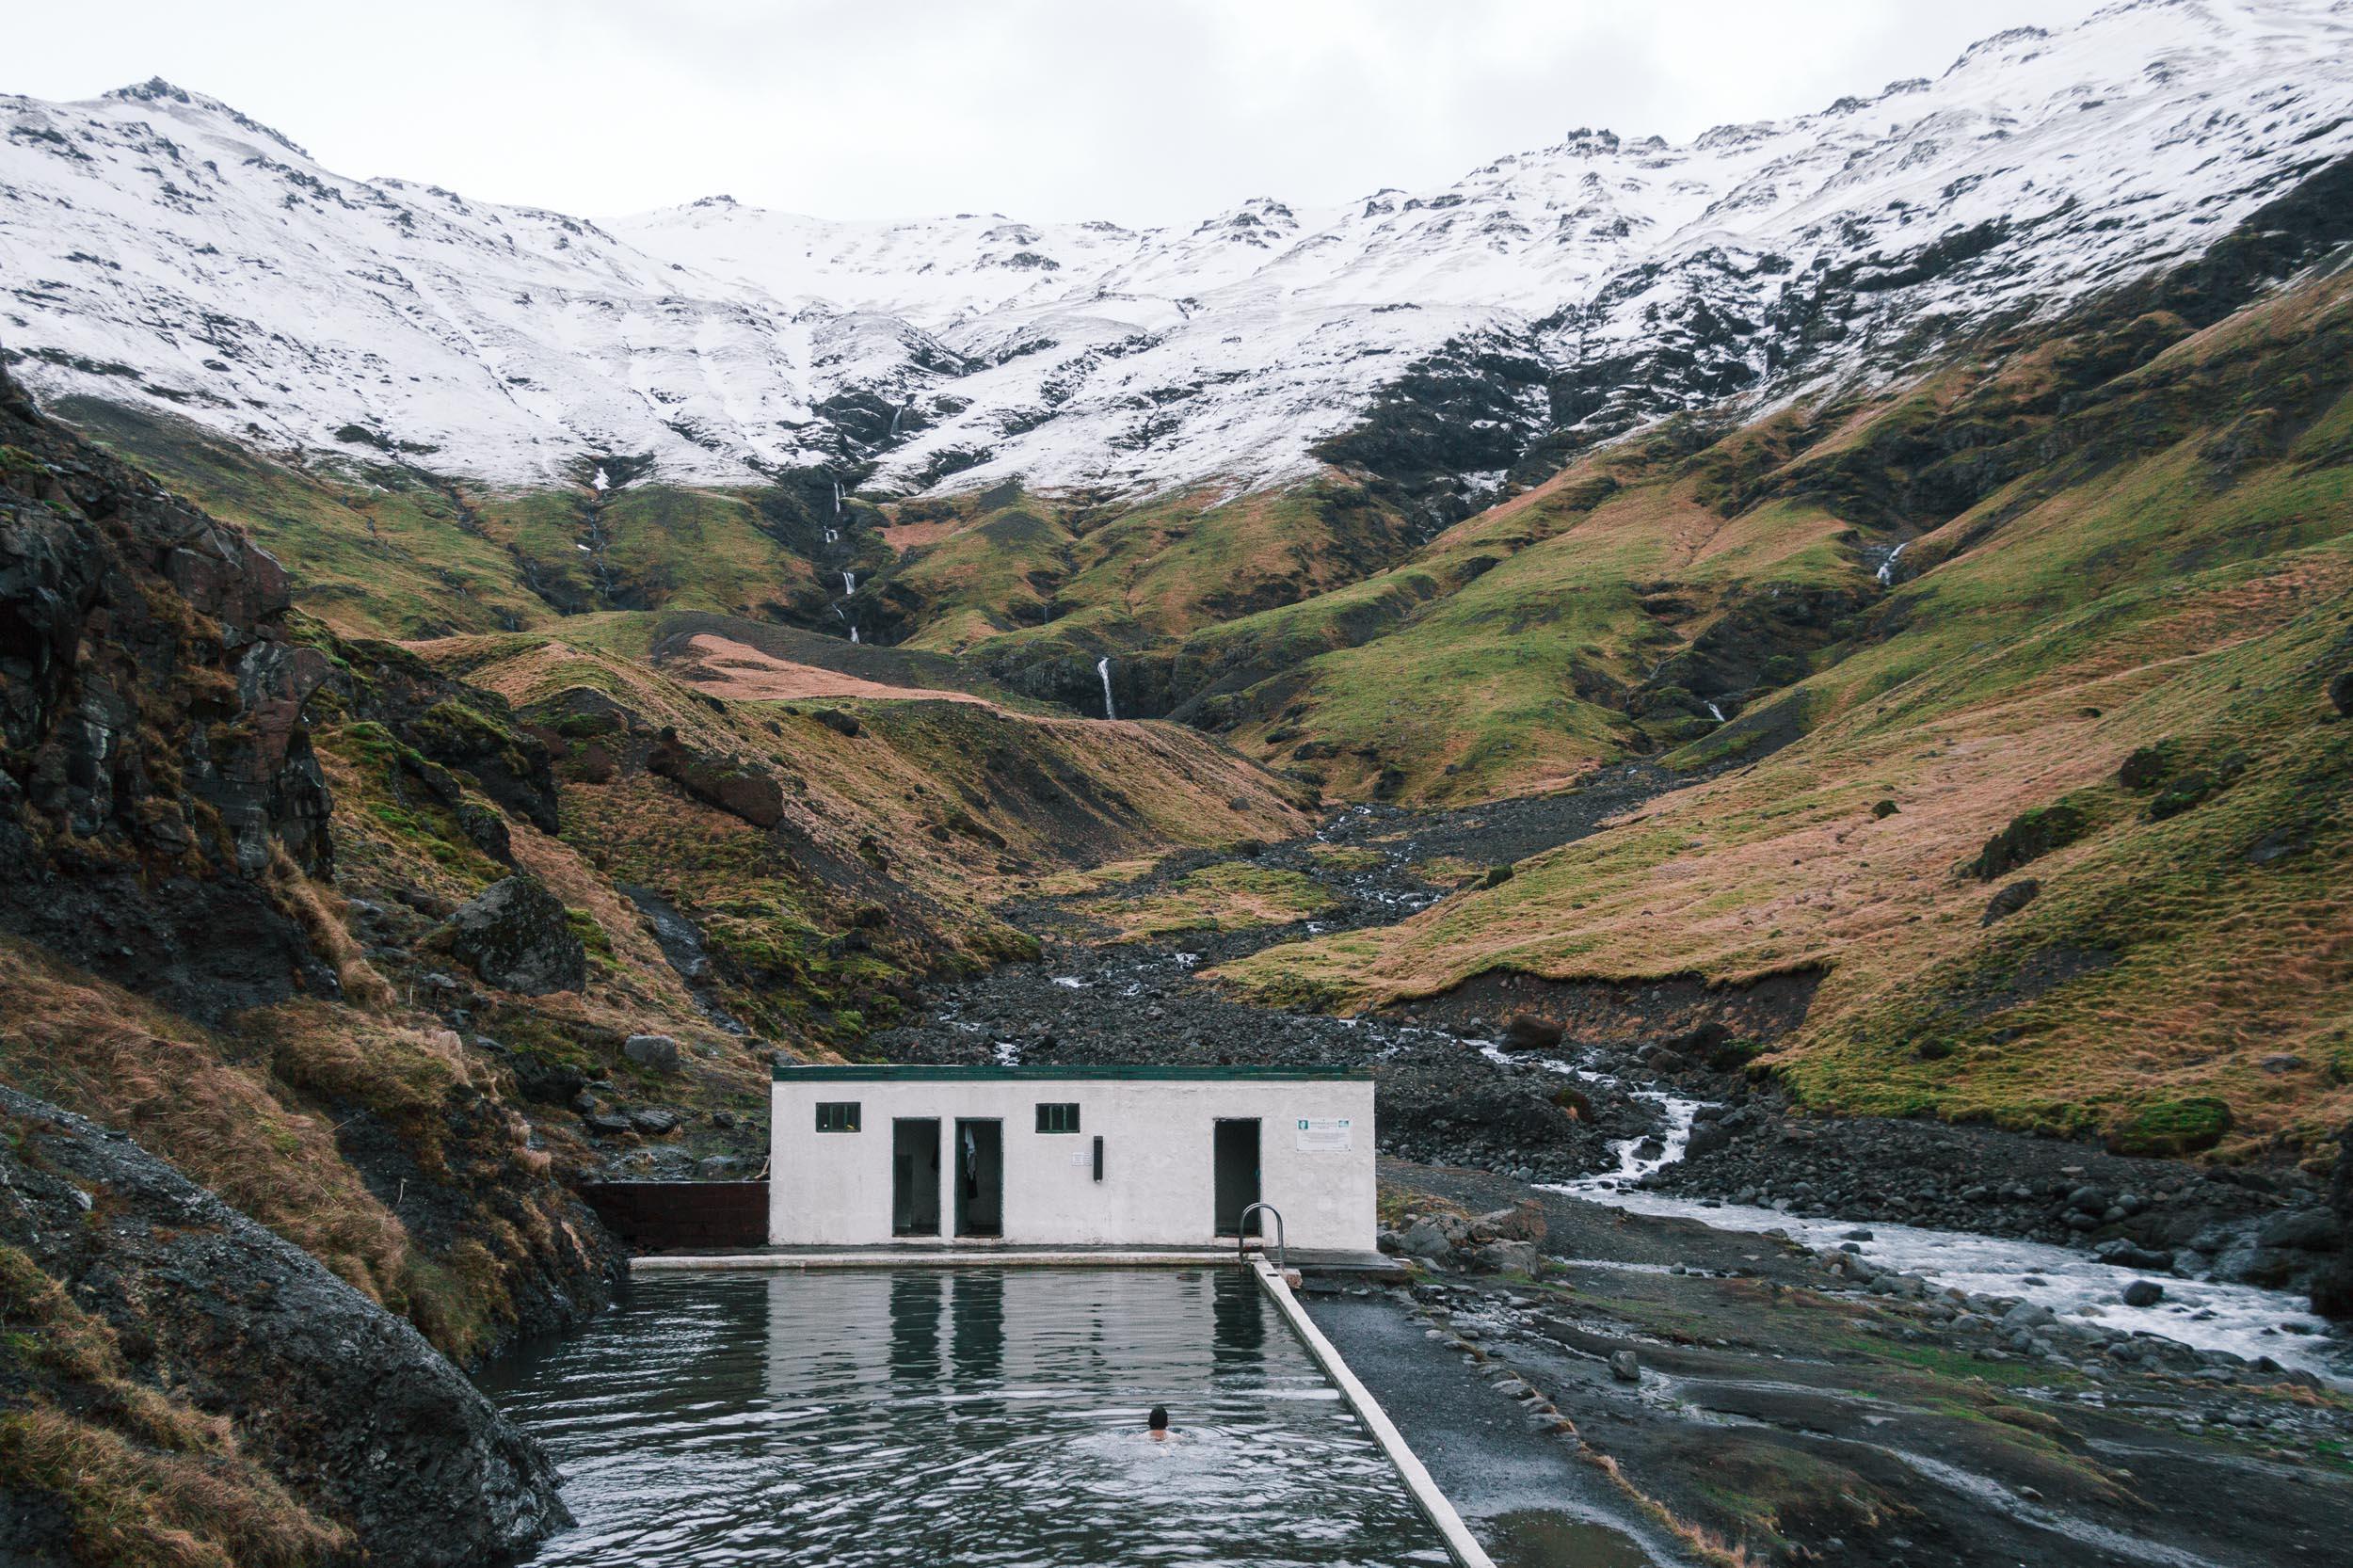 annadosenes-Travel diary-Water-17.jpg